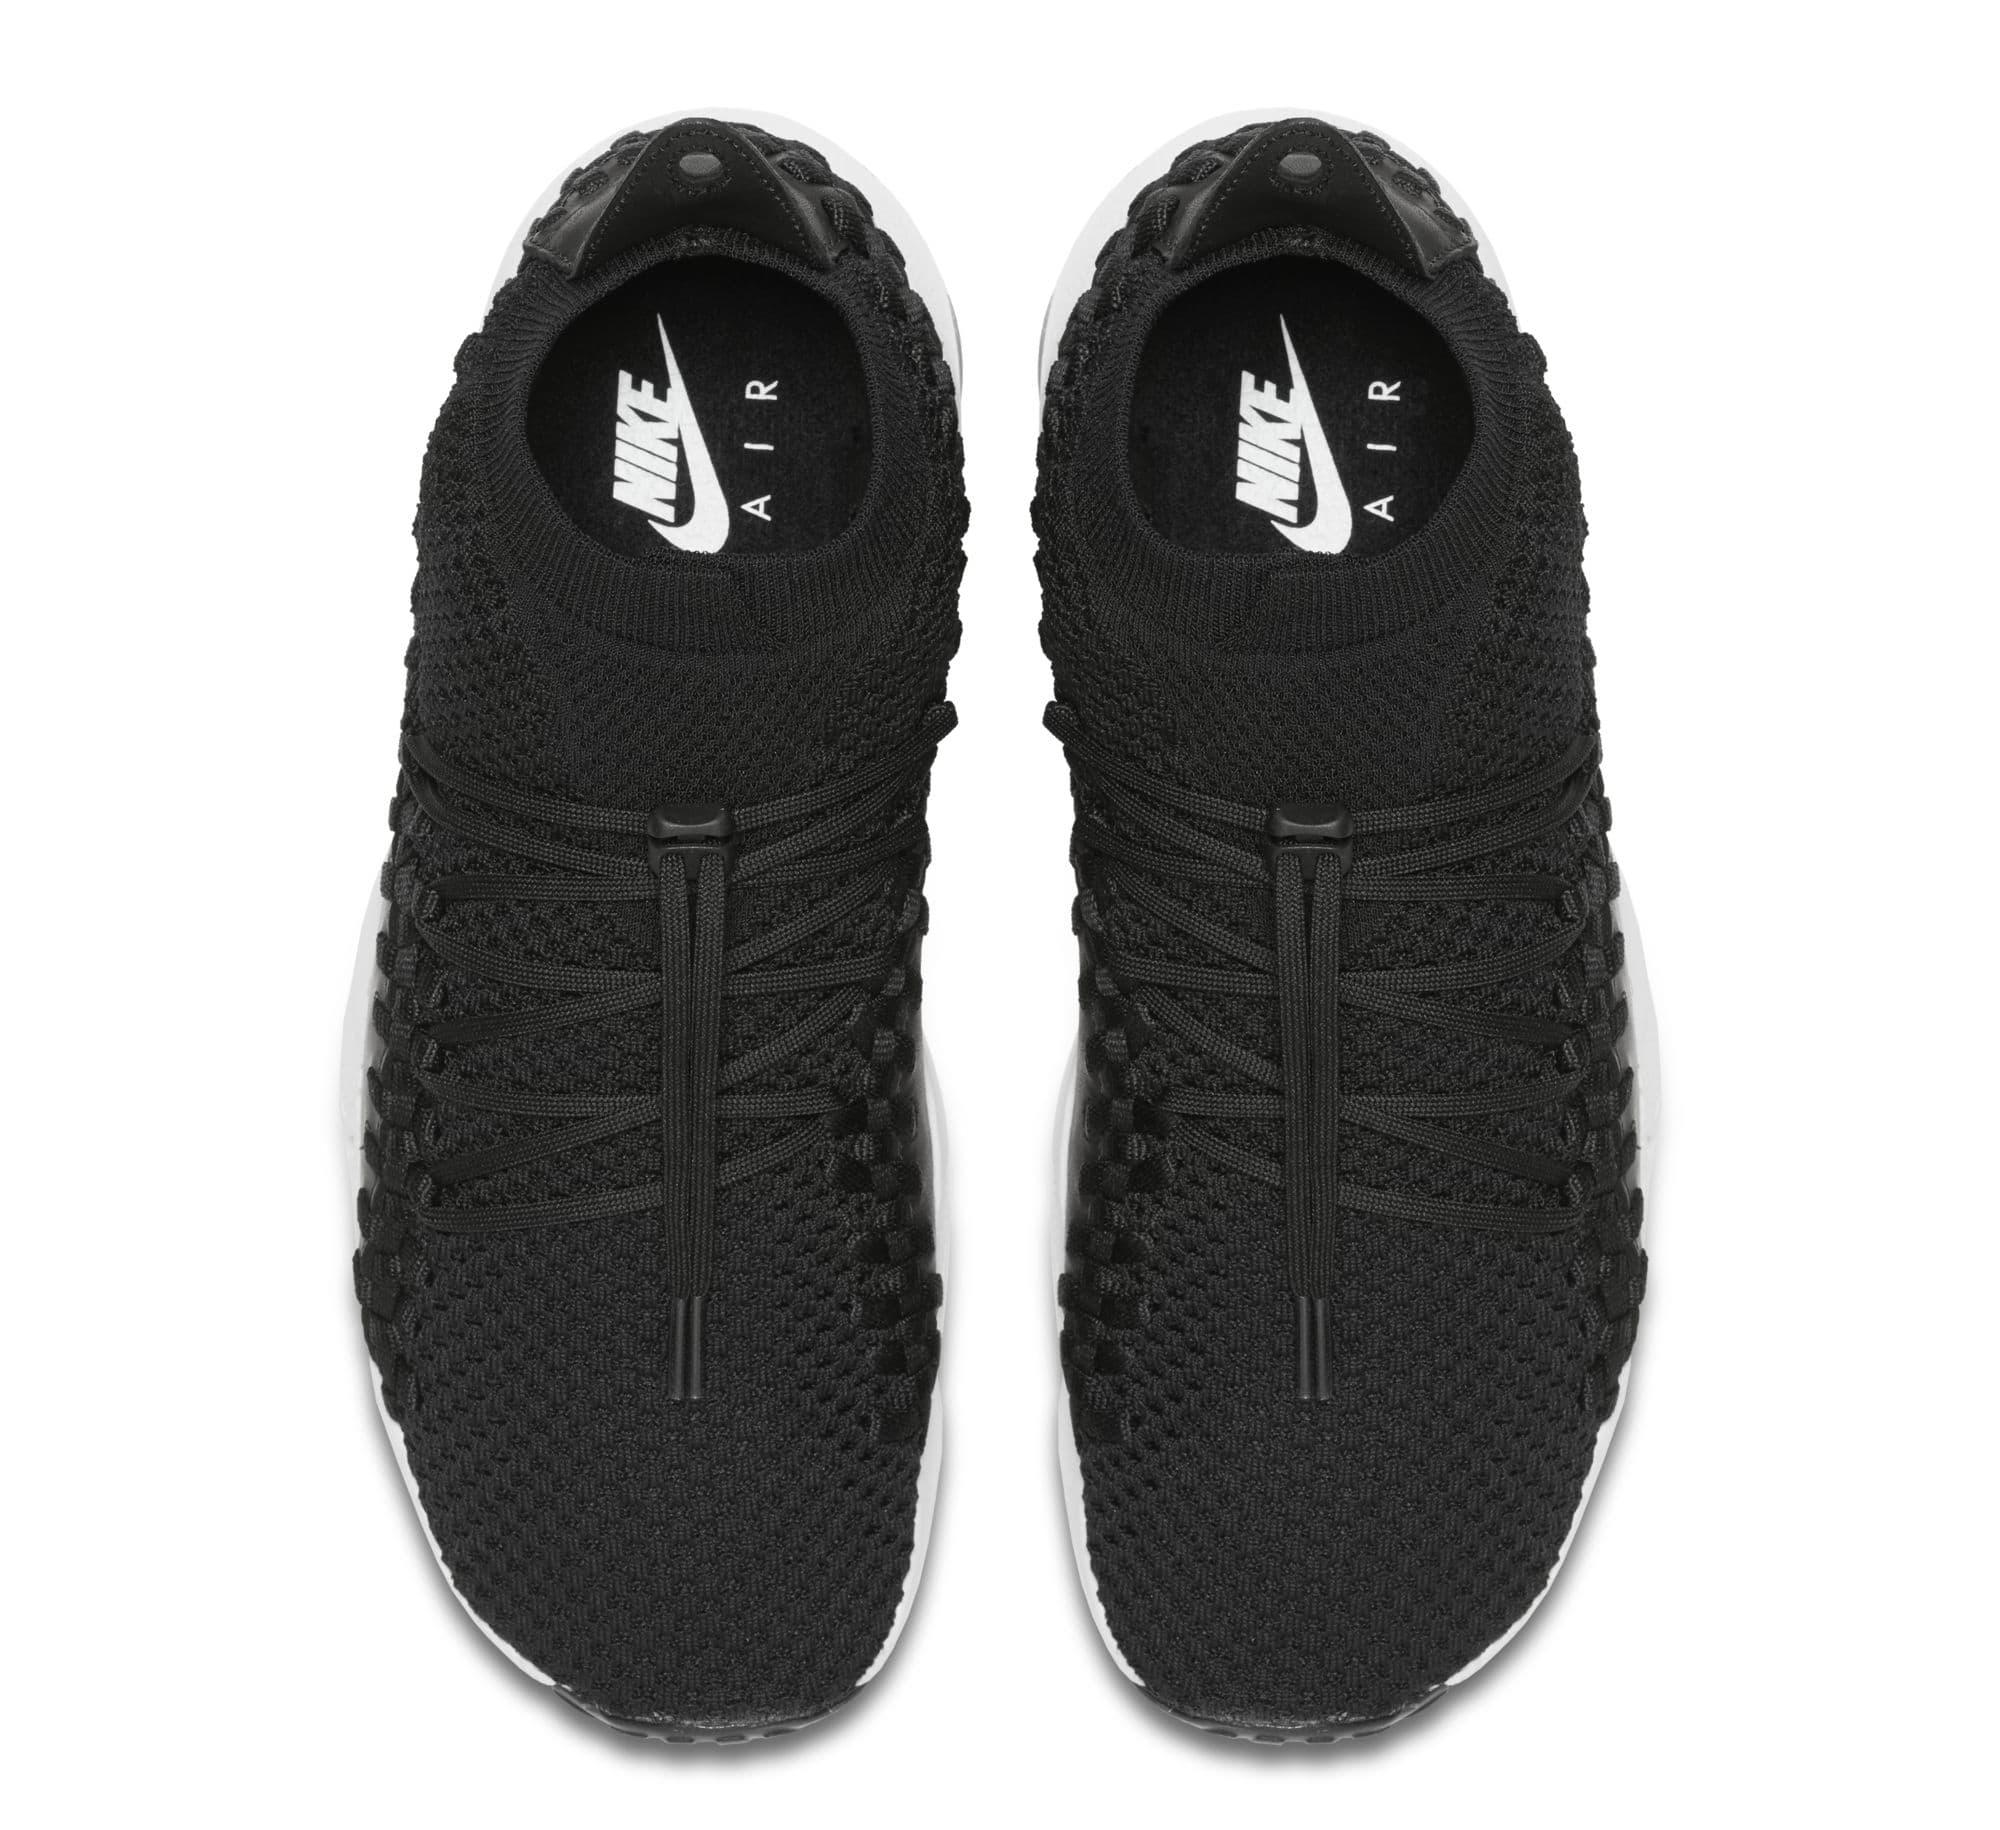 Nike Footscape Woven Chukka Flyknit 'Black' AO5417-001 (Top)